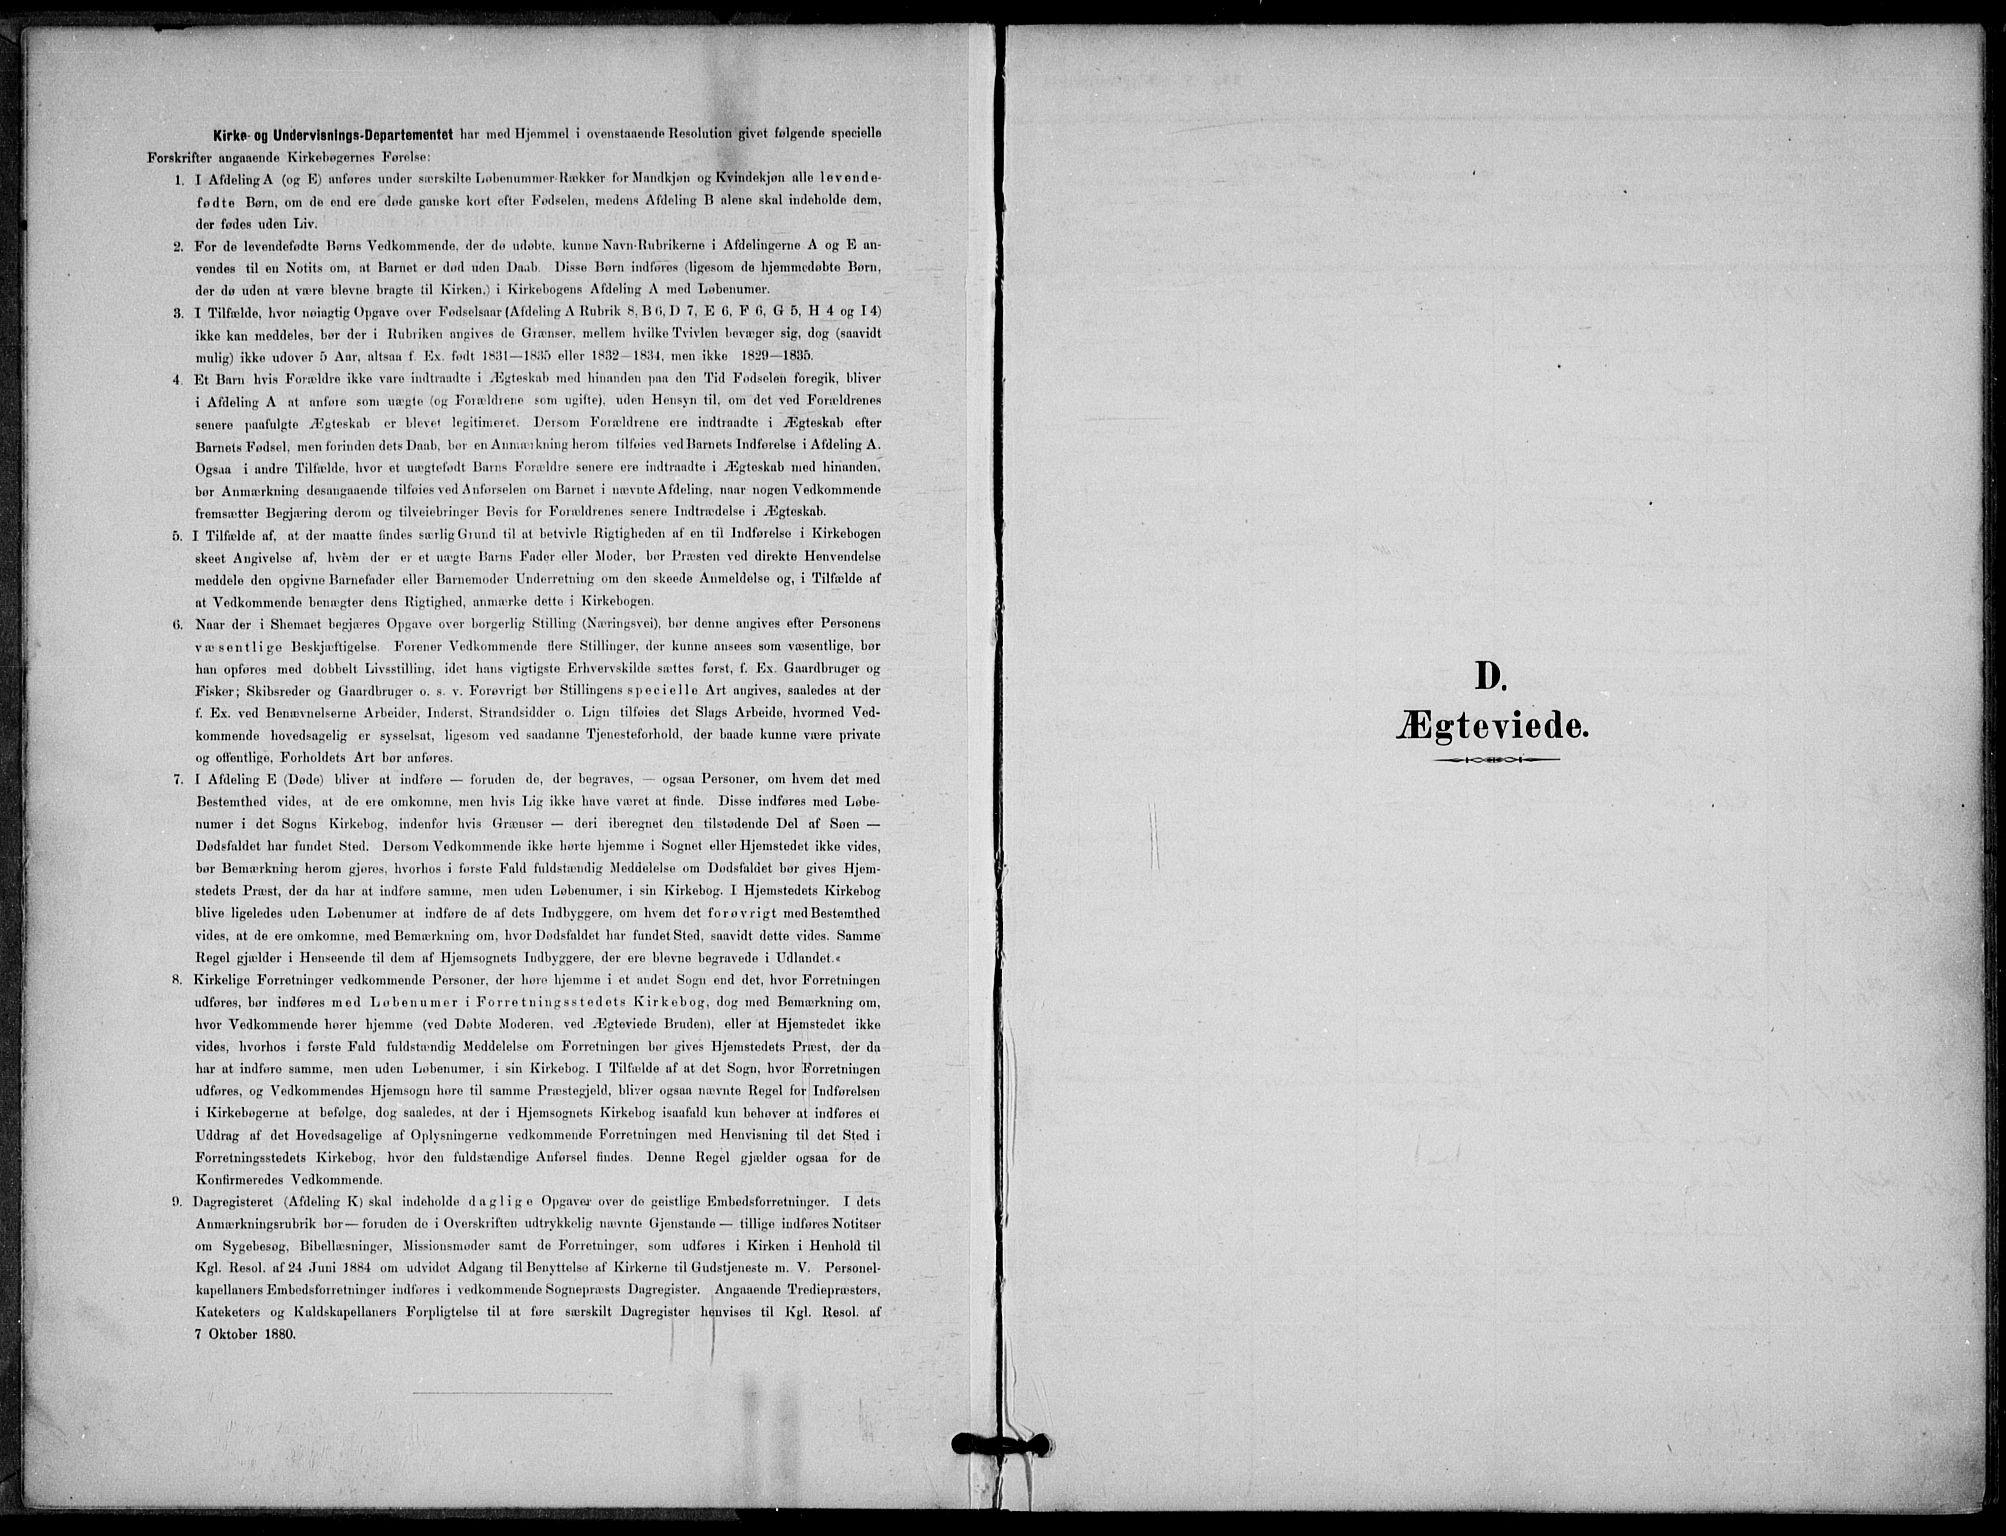 SAT, Ministerialprotokoller, klokkerbøker og fødselsregistre - Nordland, 825/L0363: Ministerialbok nr. 825A17, 1890-1909